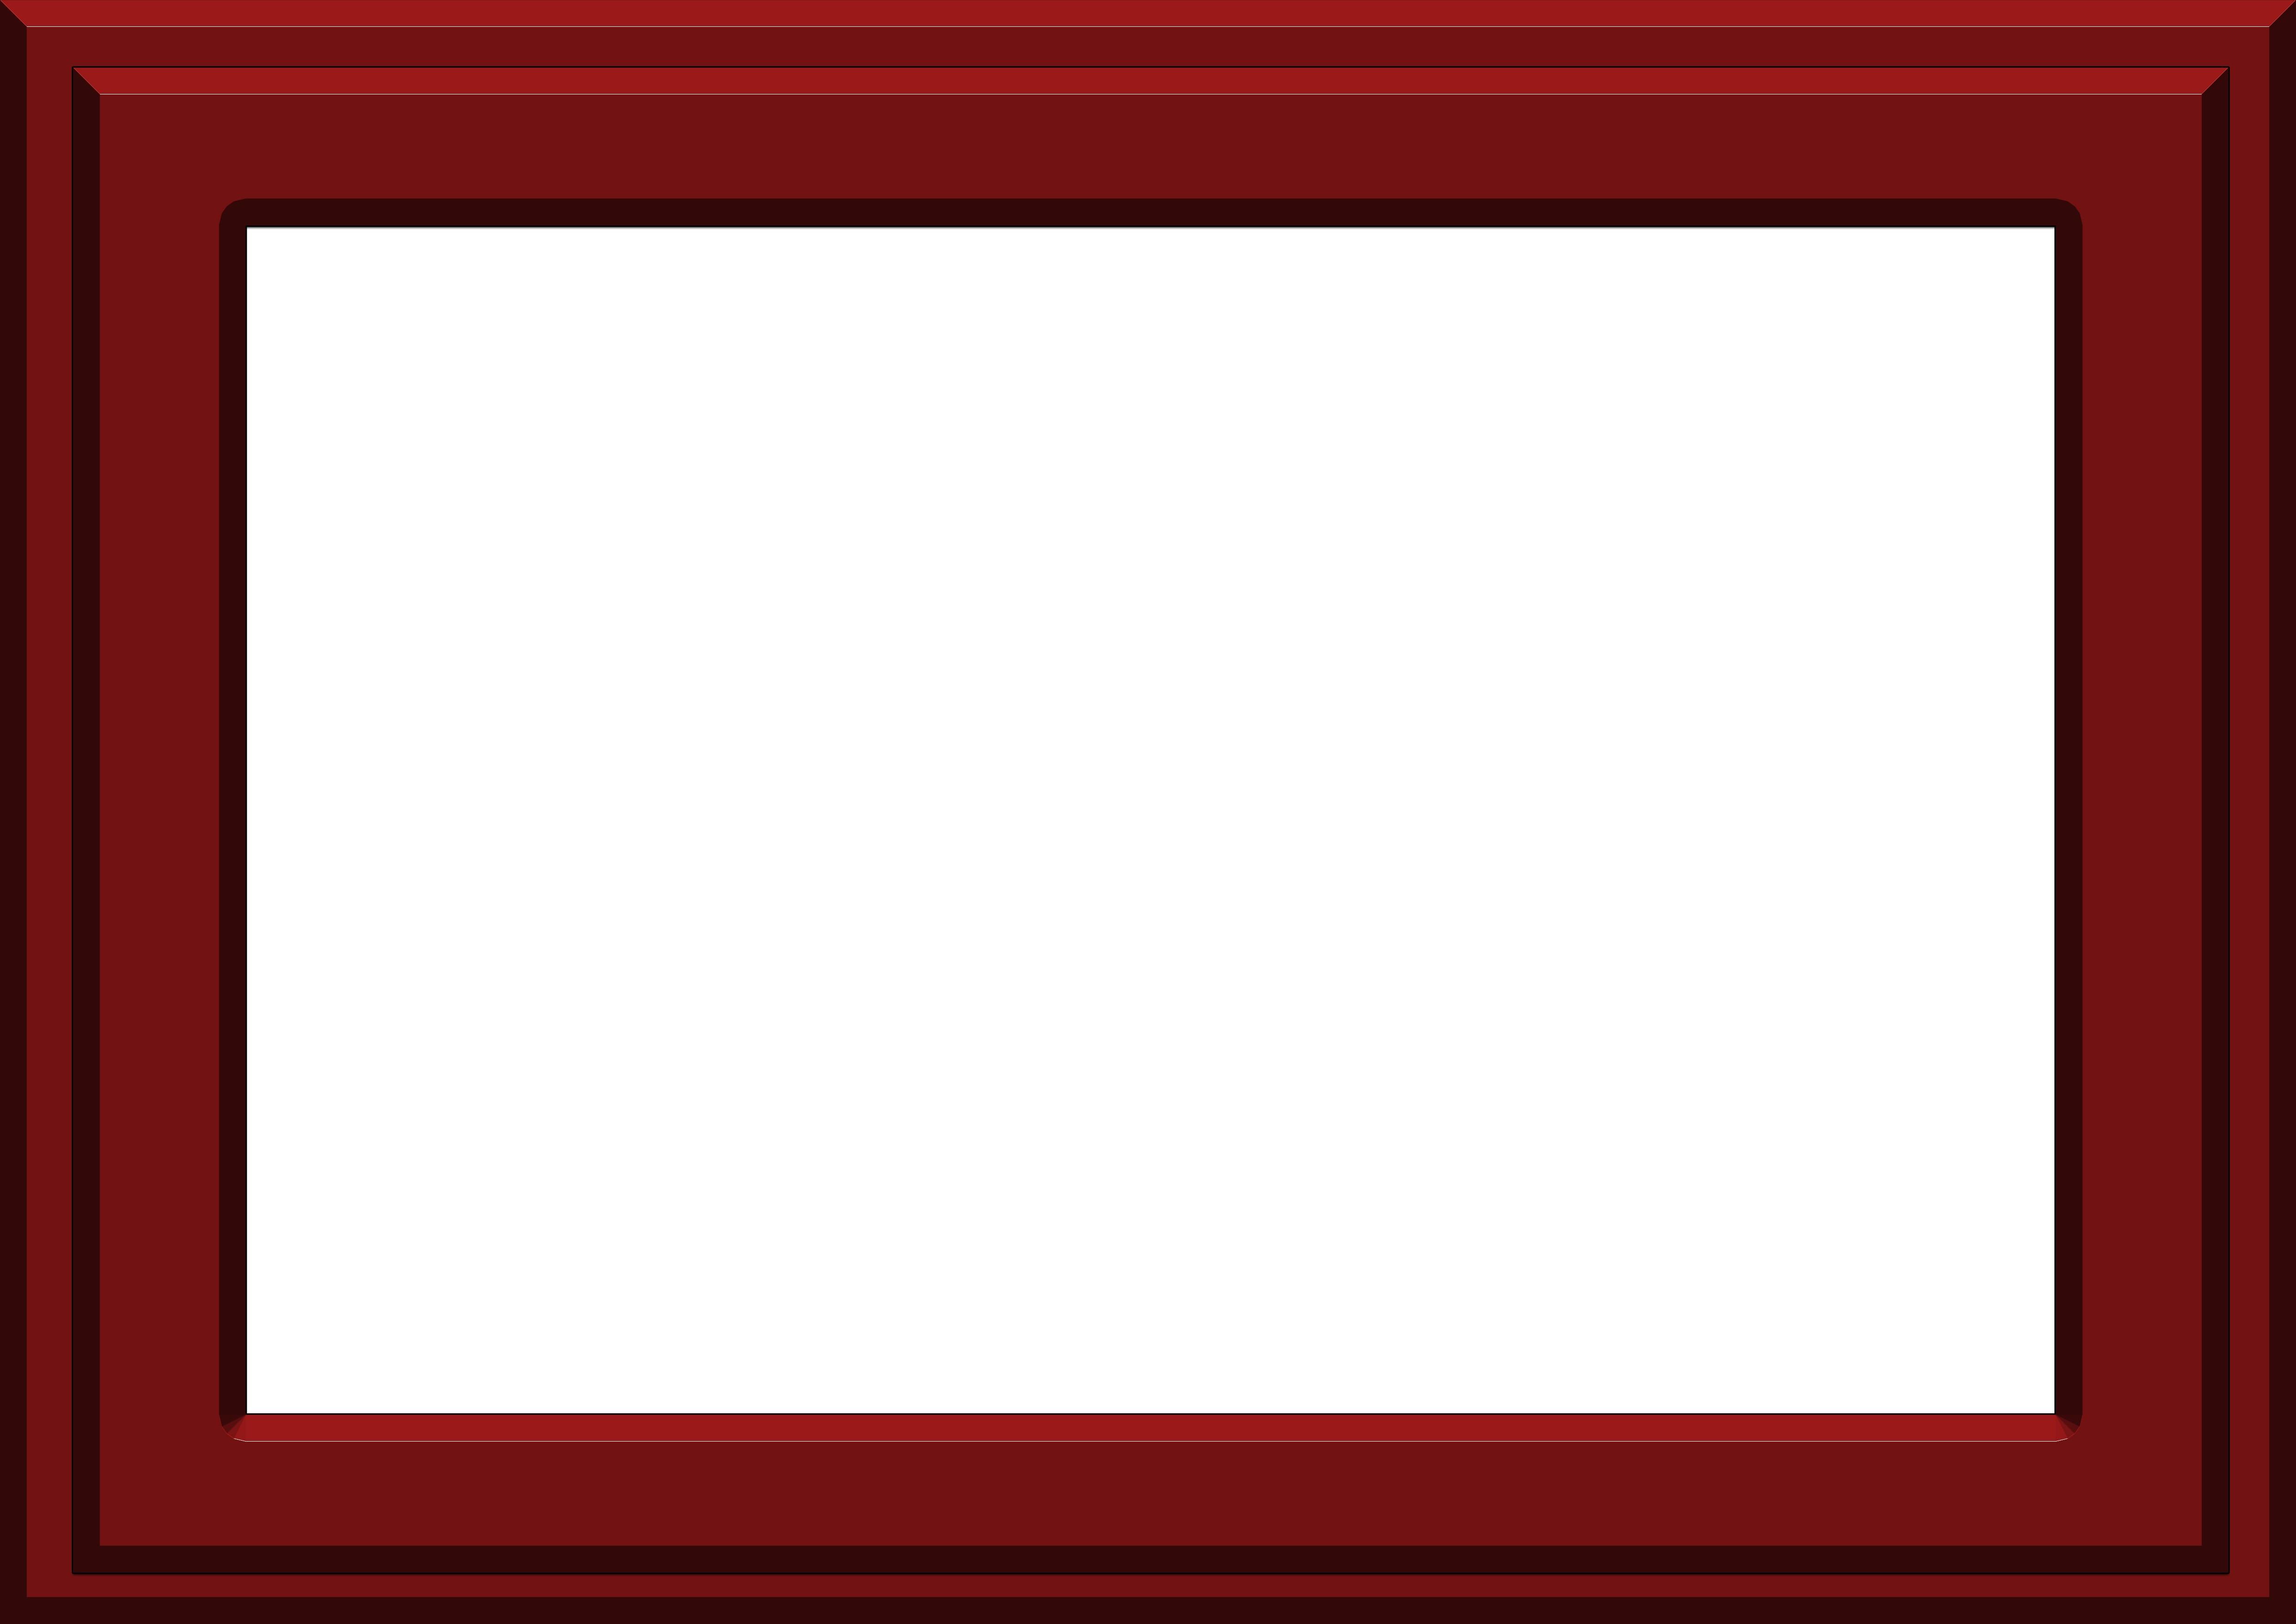 Red frame border 2 - Photopublicdomain.com